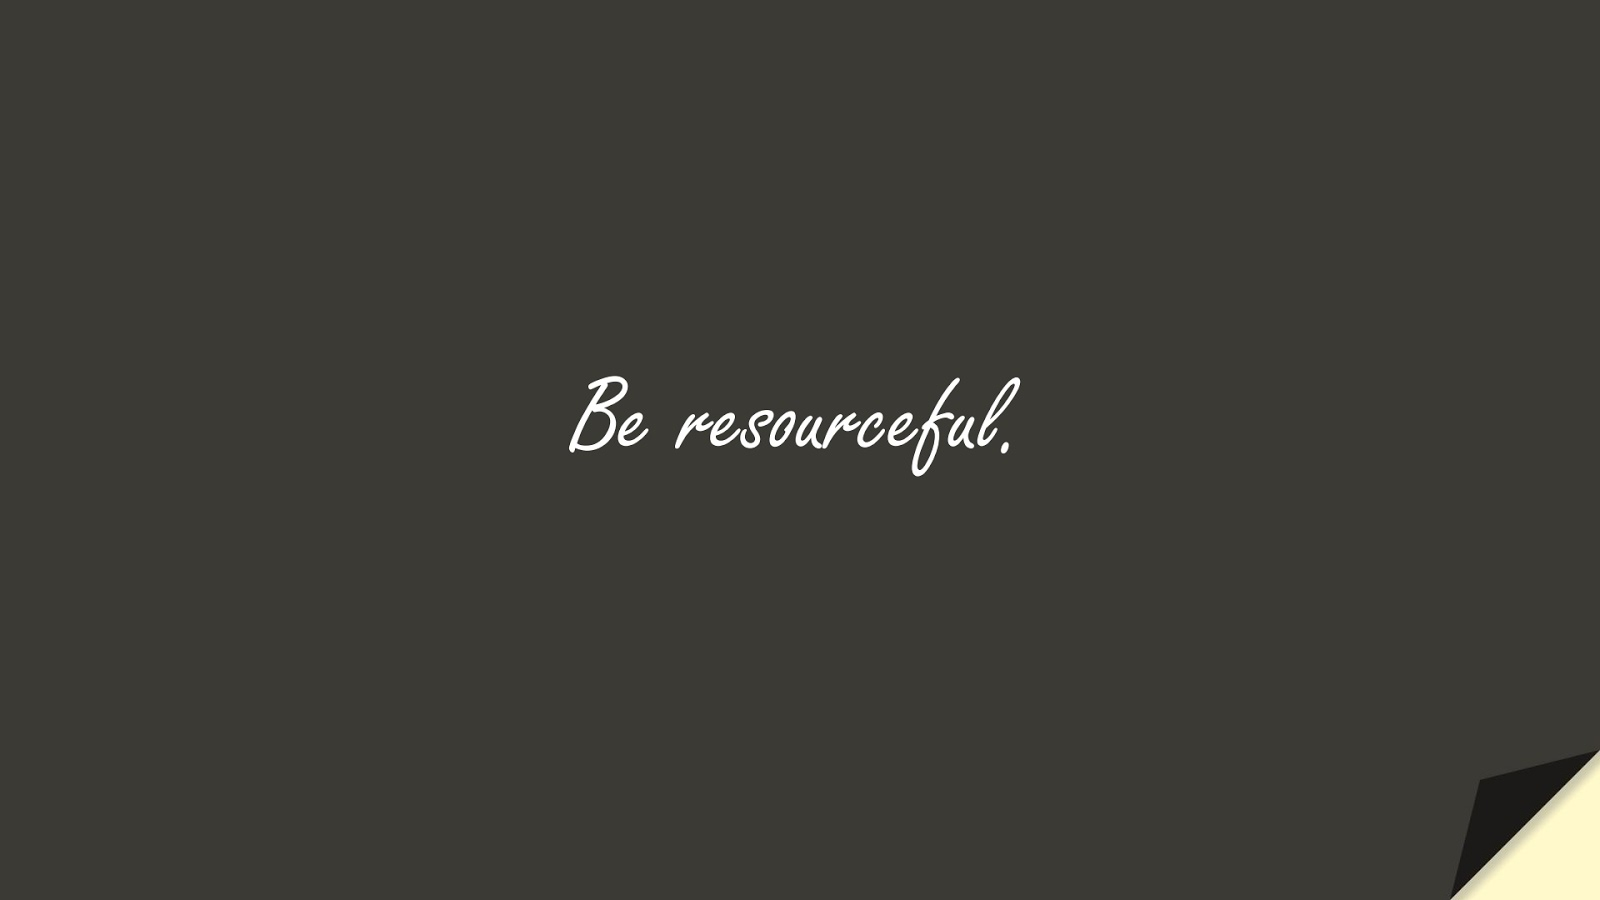 Be resourceful.FALSE